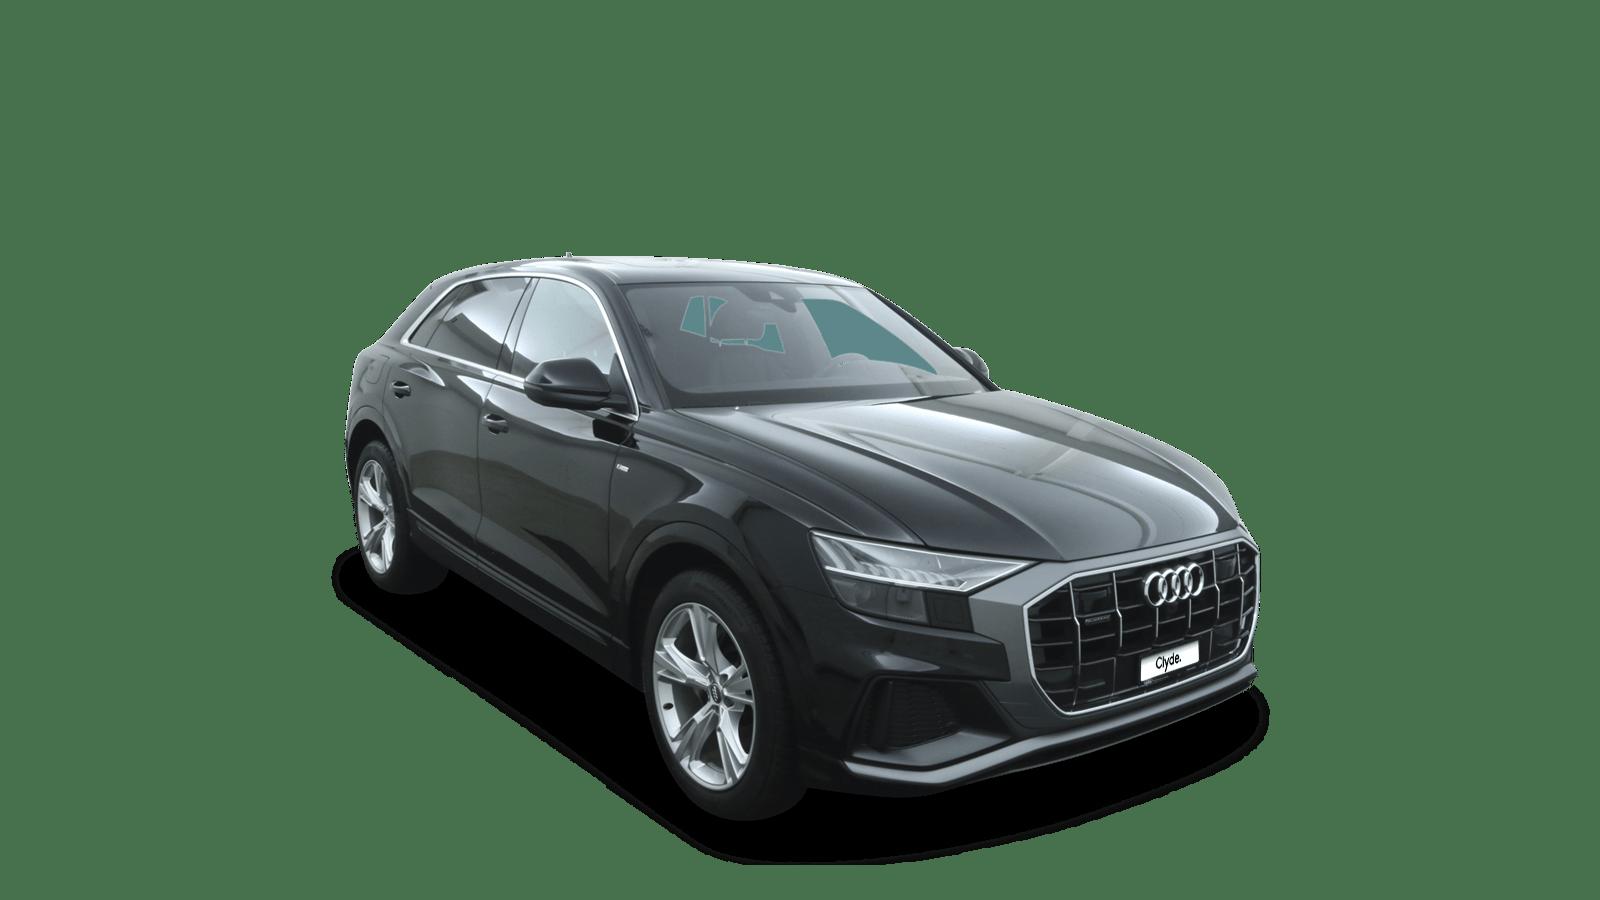 Audi Q8 Black front - Clyde car subscription